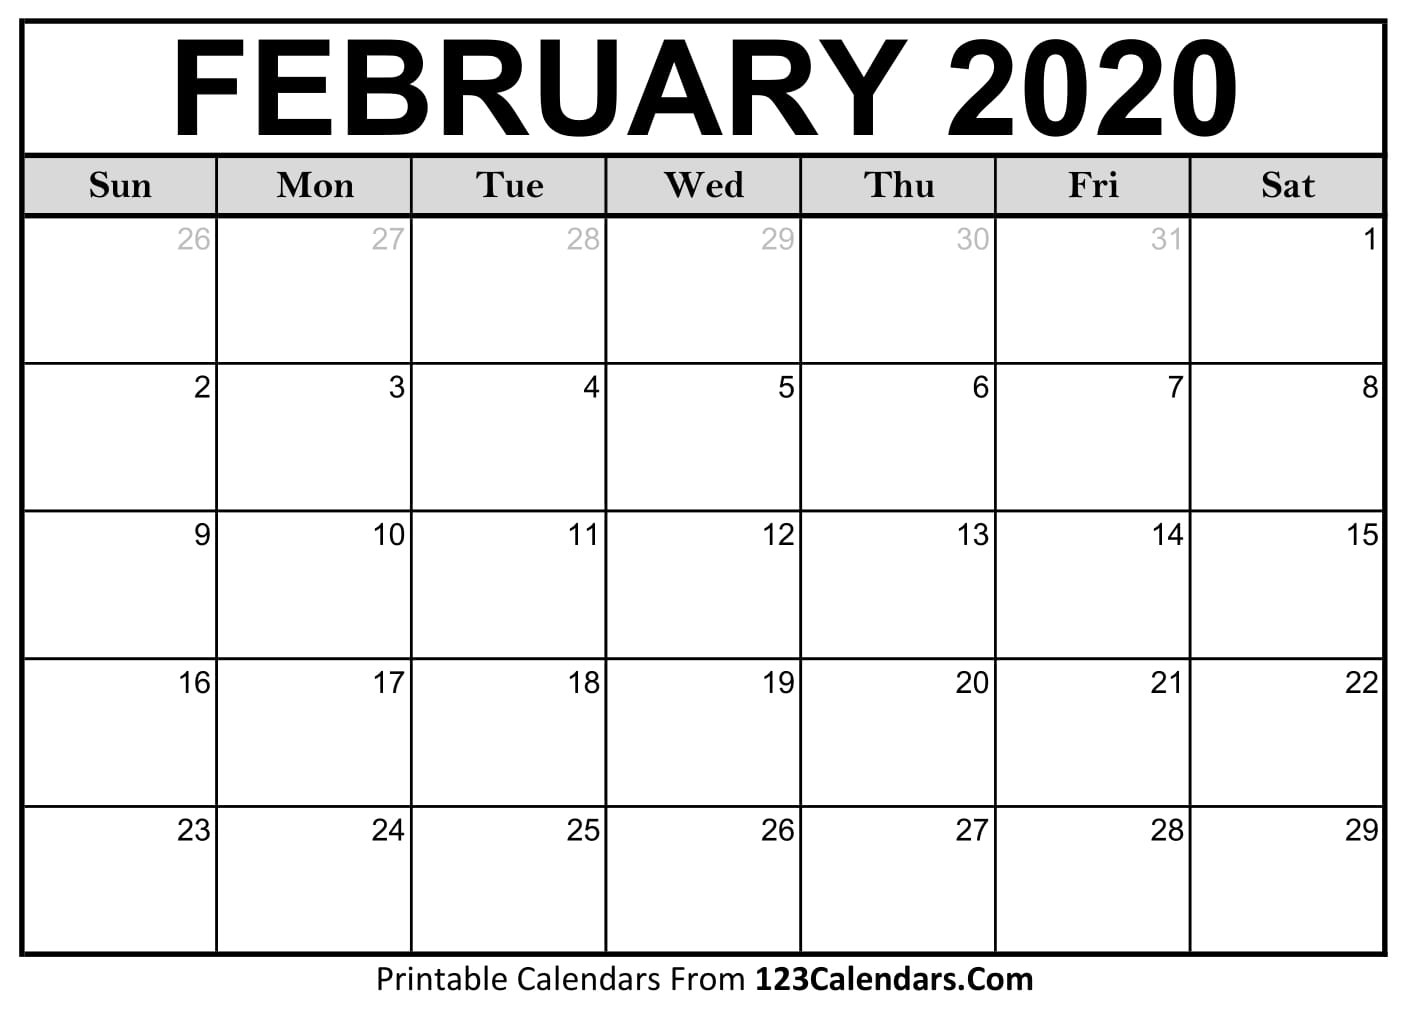 February 2020 Printable Calendar | 123Calendars  February Blank Calendar Printable